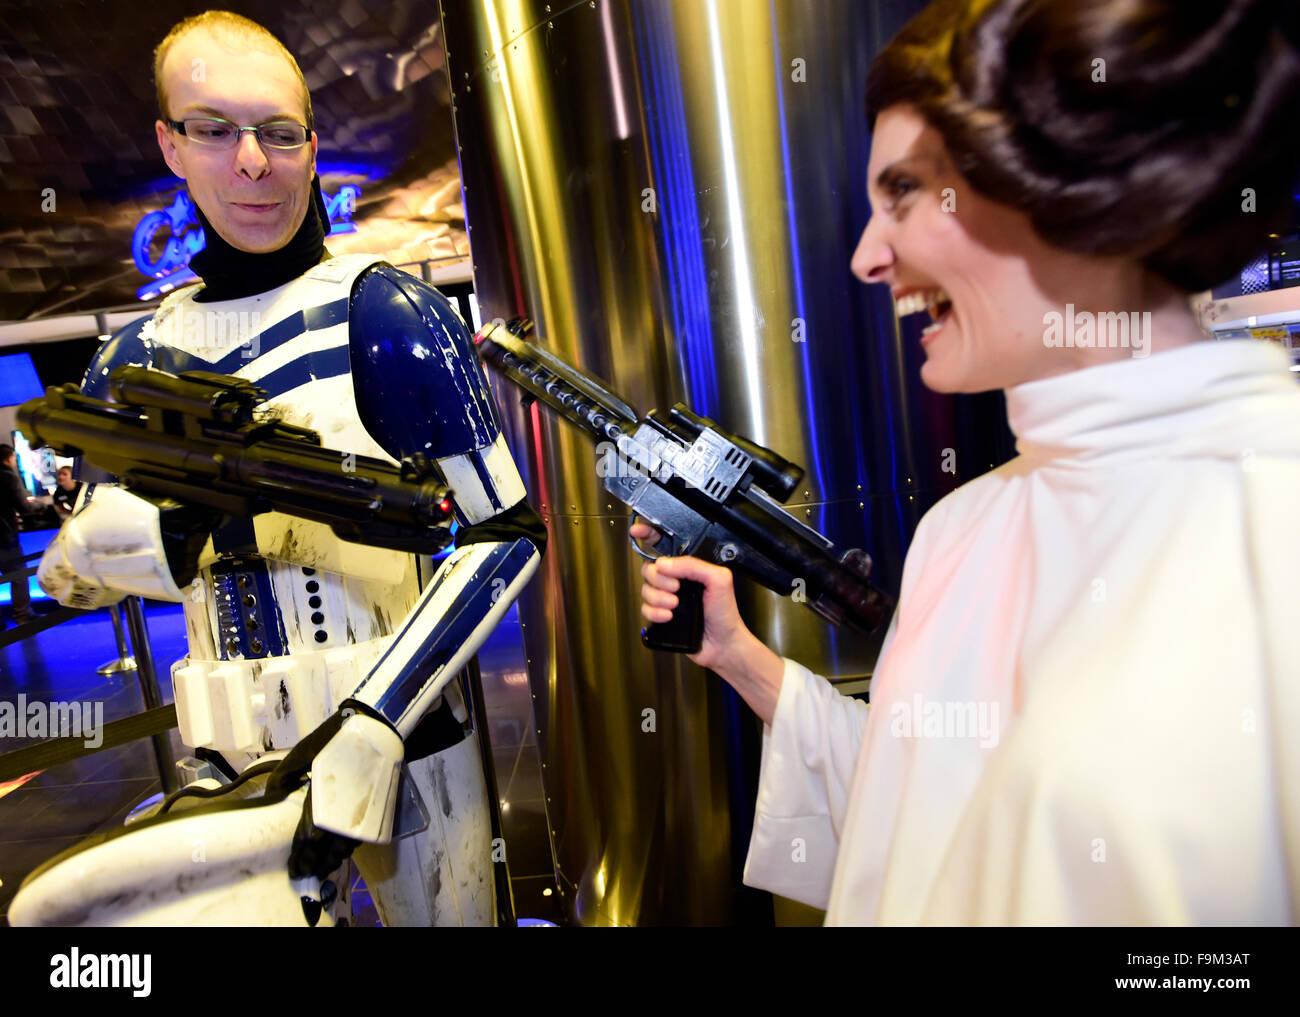 Prague, Czech Republic. 16th Dec, 2015. Fans of sci-fi movie saga Star Wars in costumes arrive at the Czech premiere - Stock Image